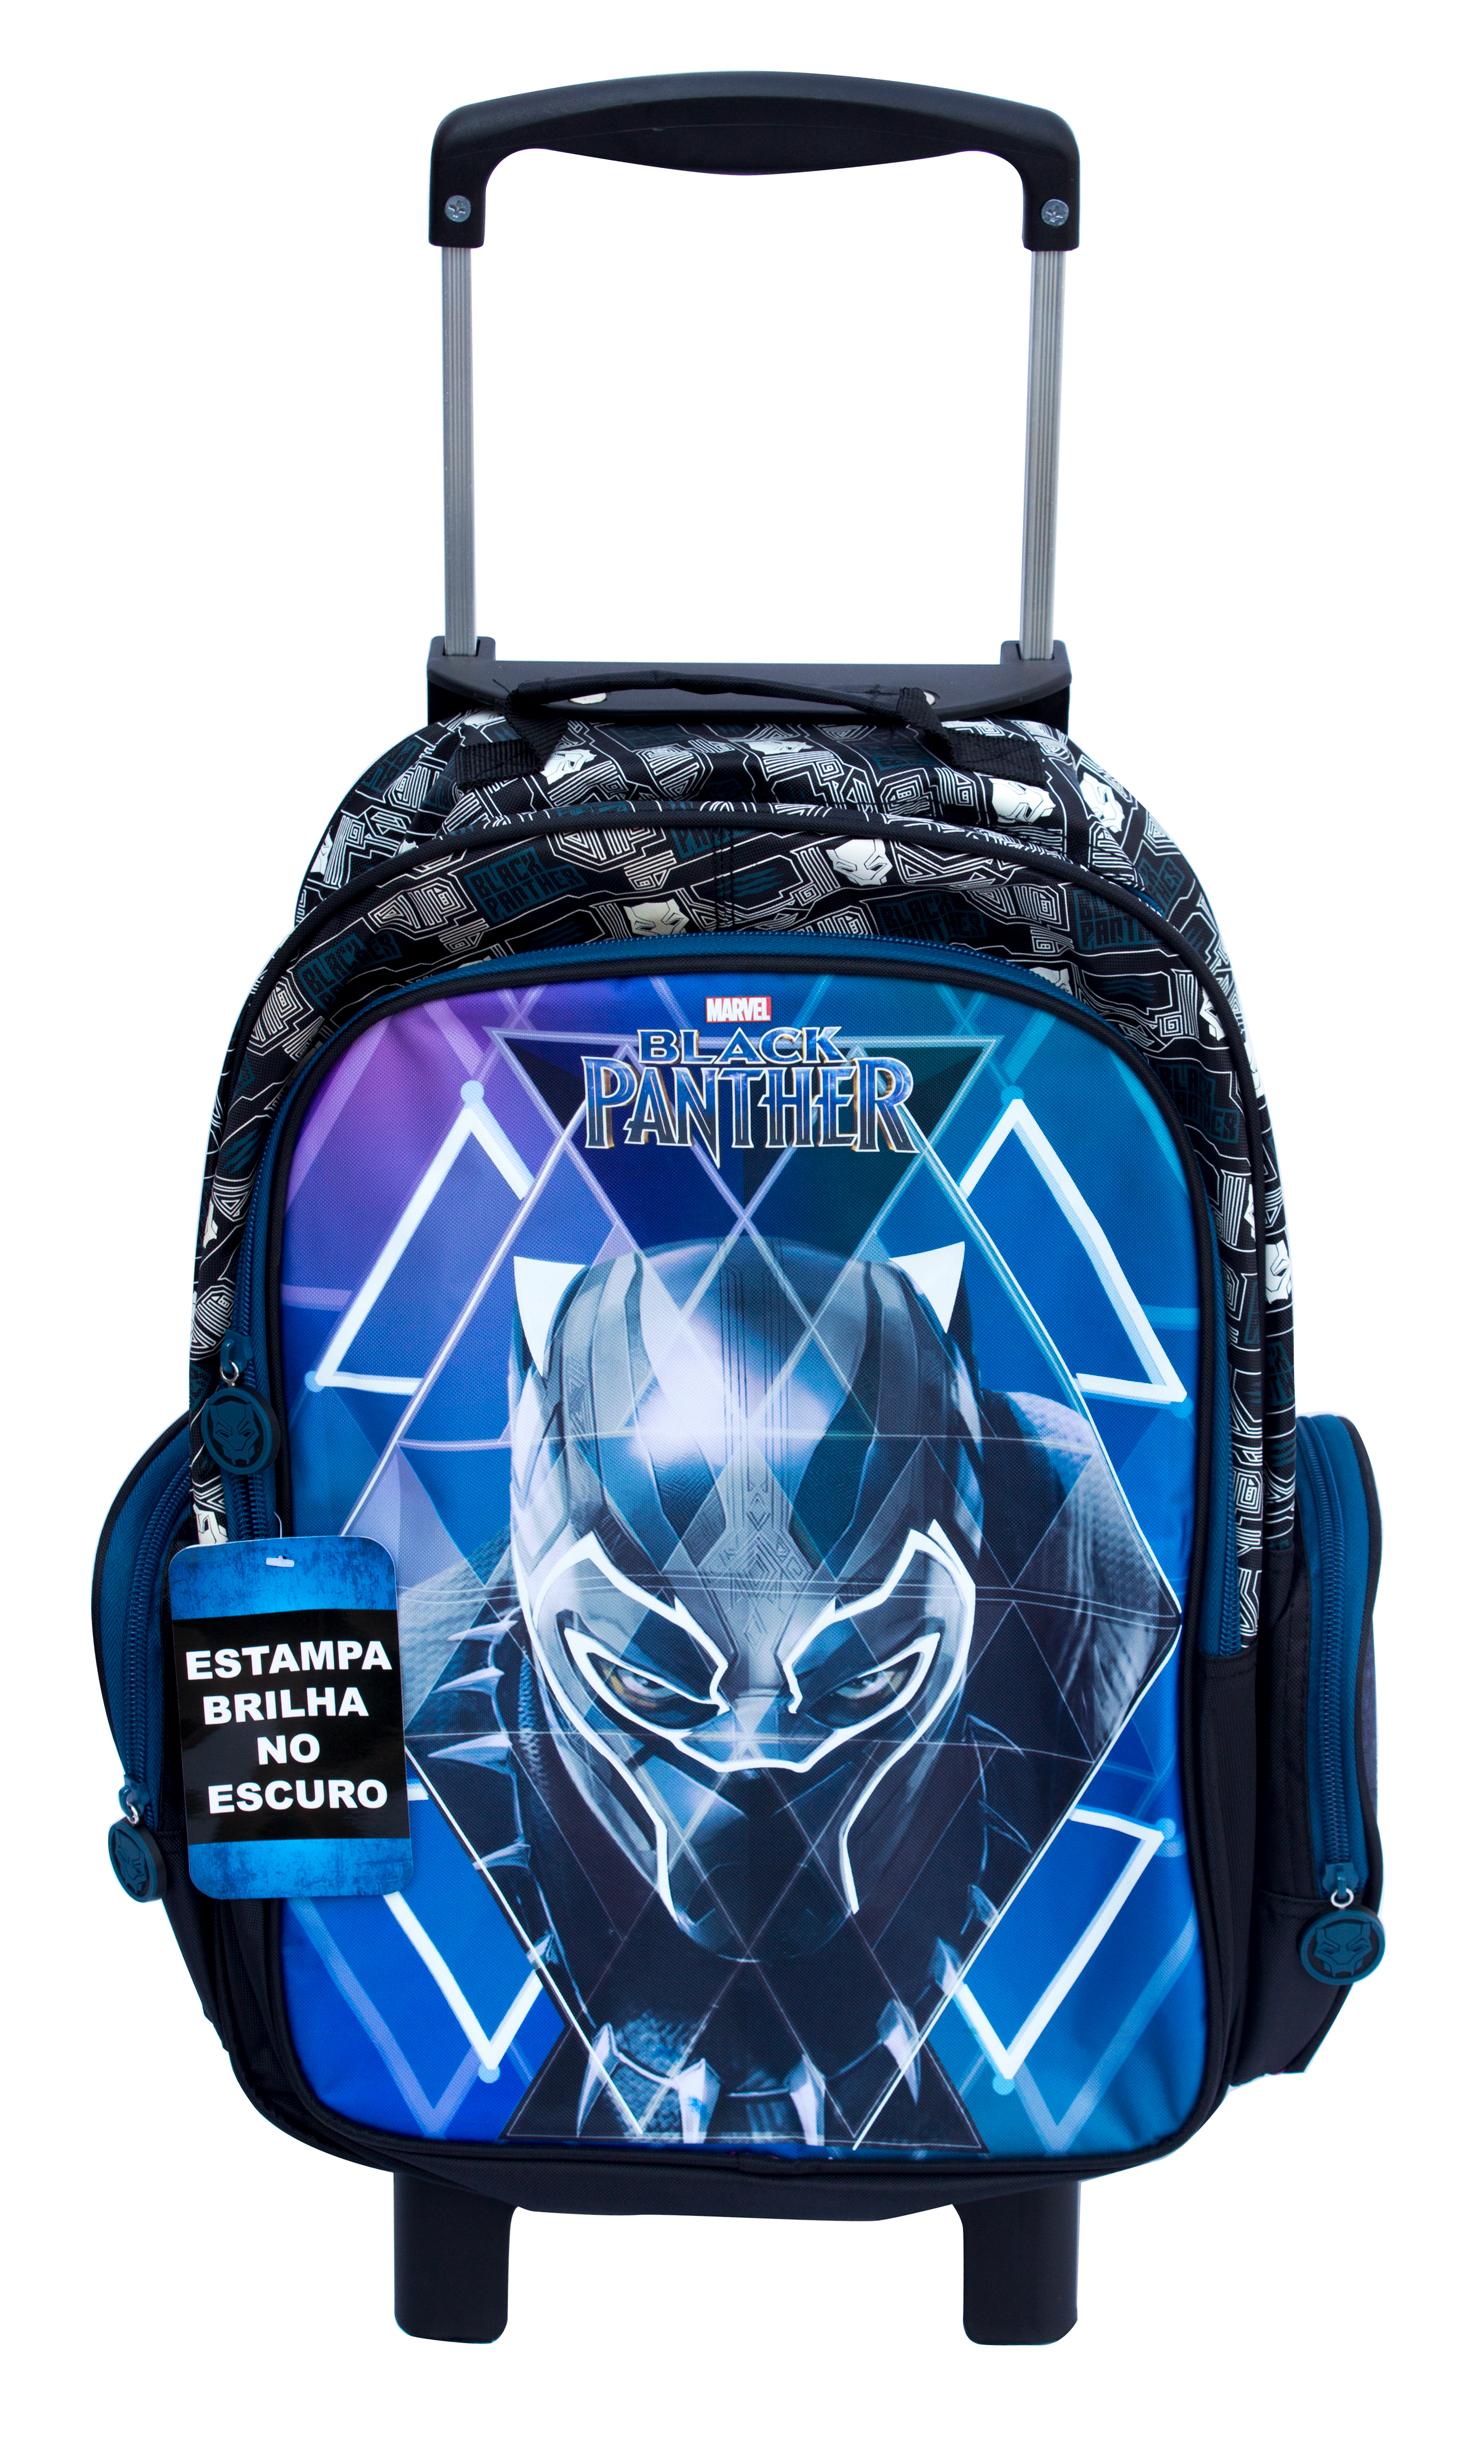 Bolsa Black Panther - Marvel